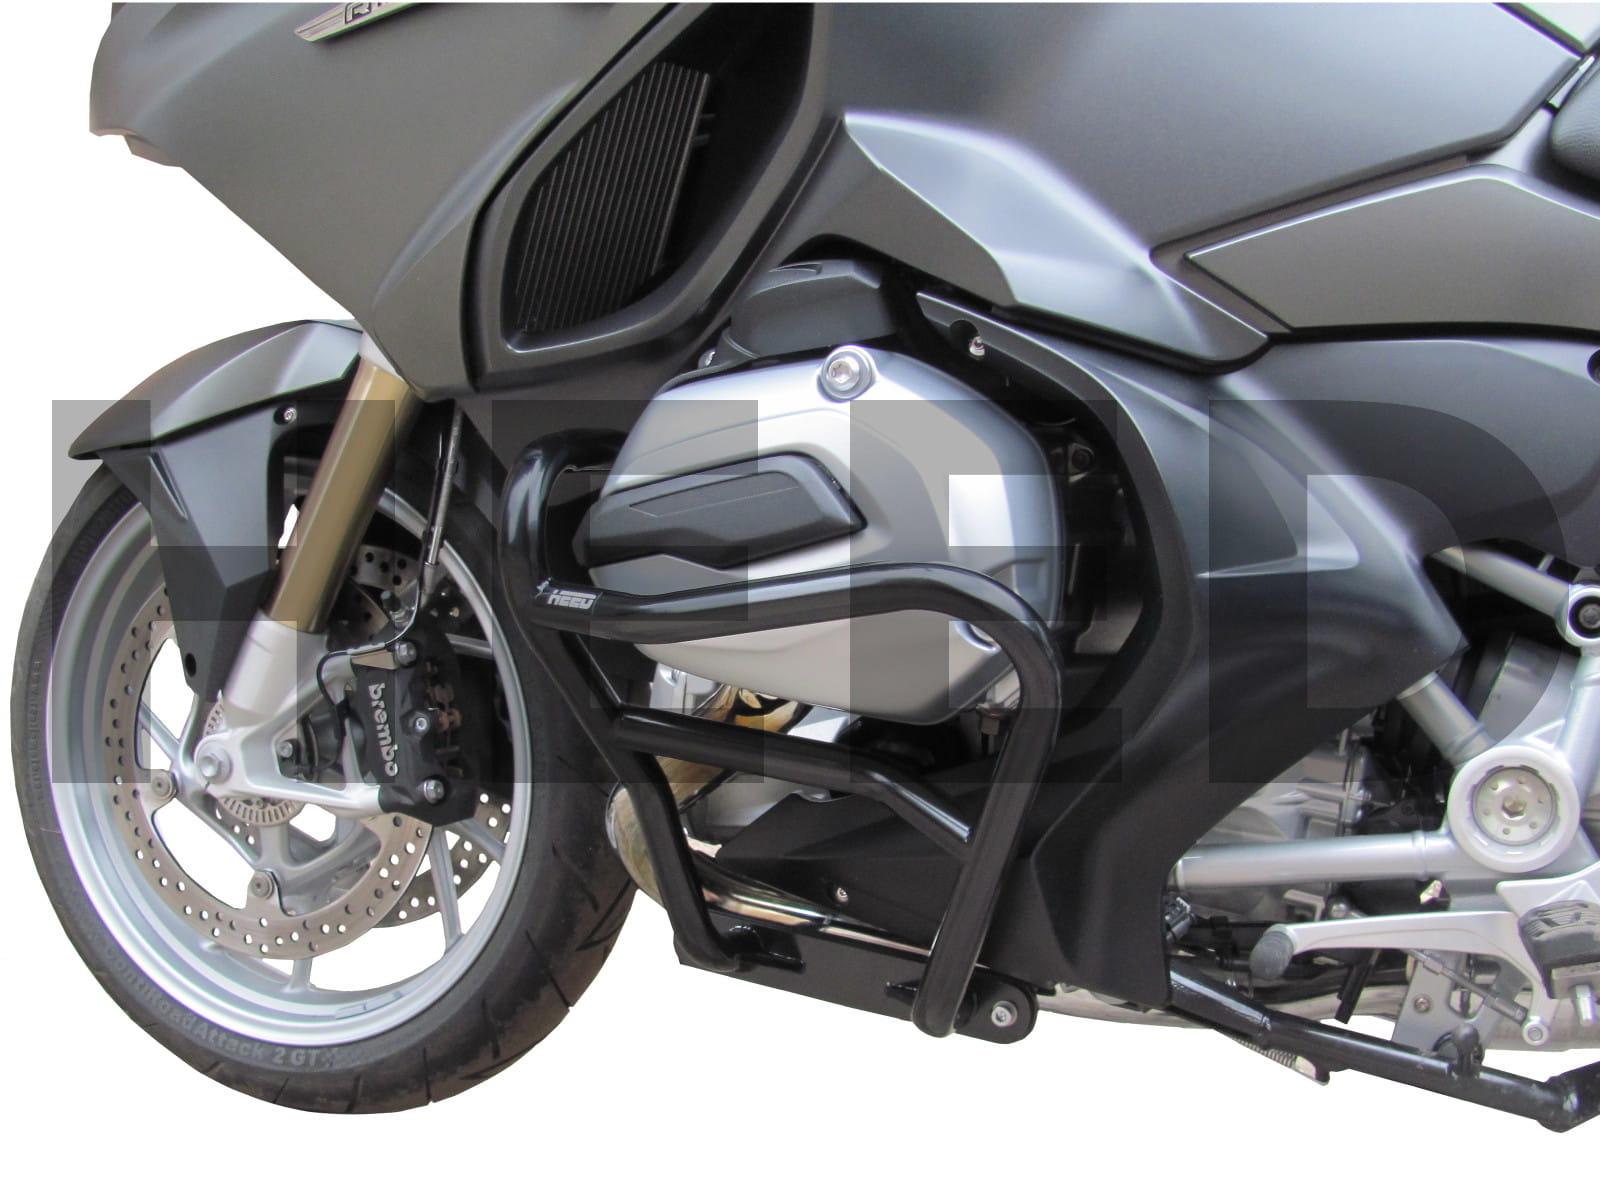 Front Crash Bars For Bmw R 1200 Rt Lc 2014 2018 Black